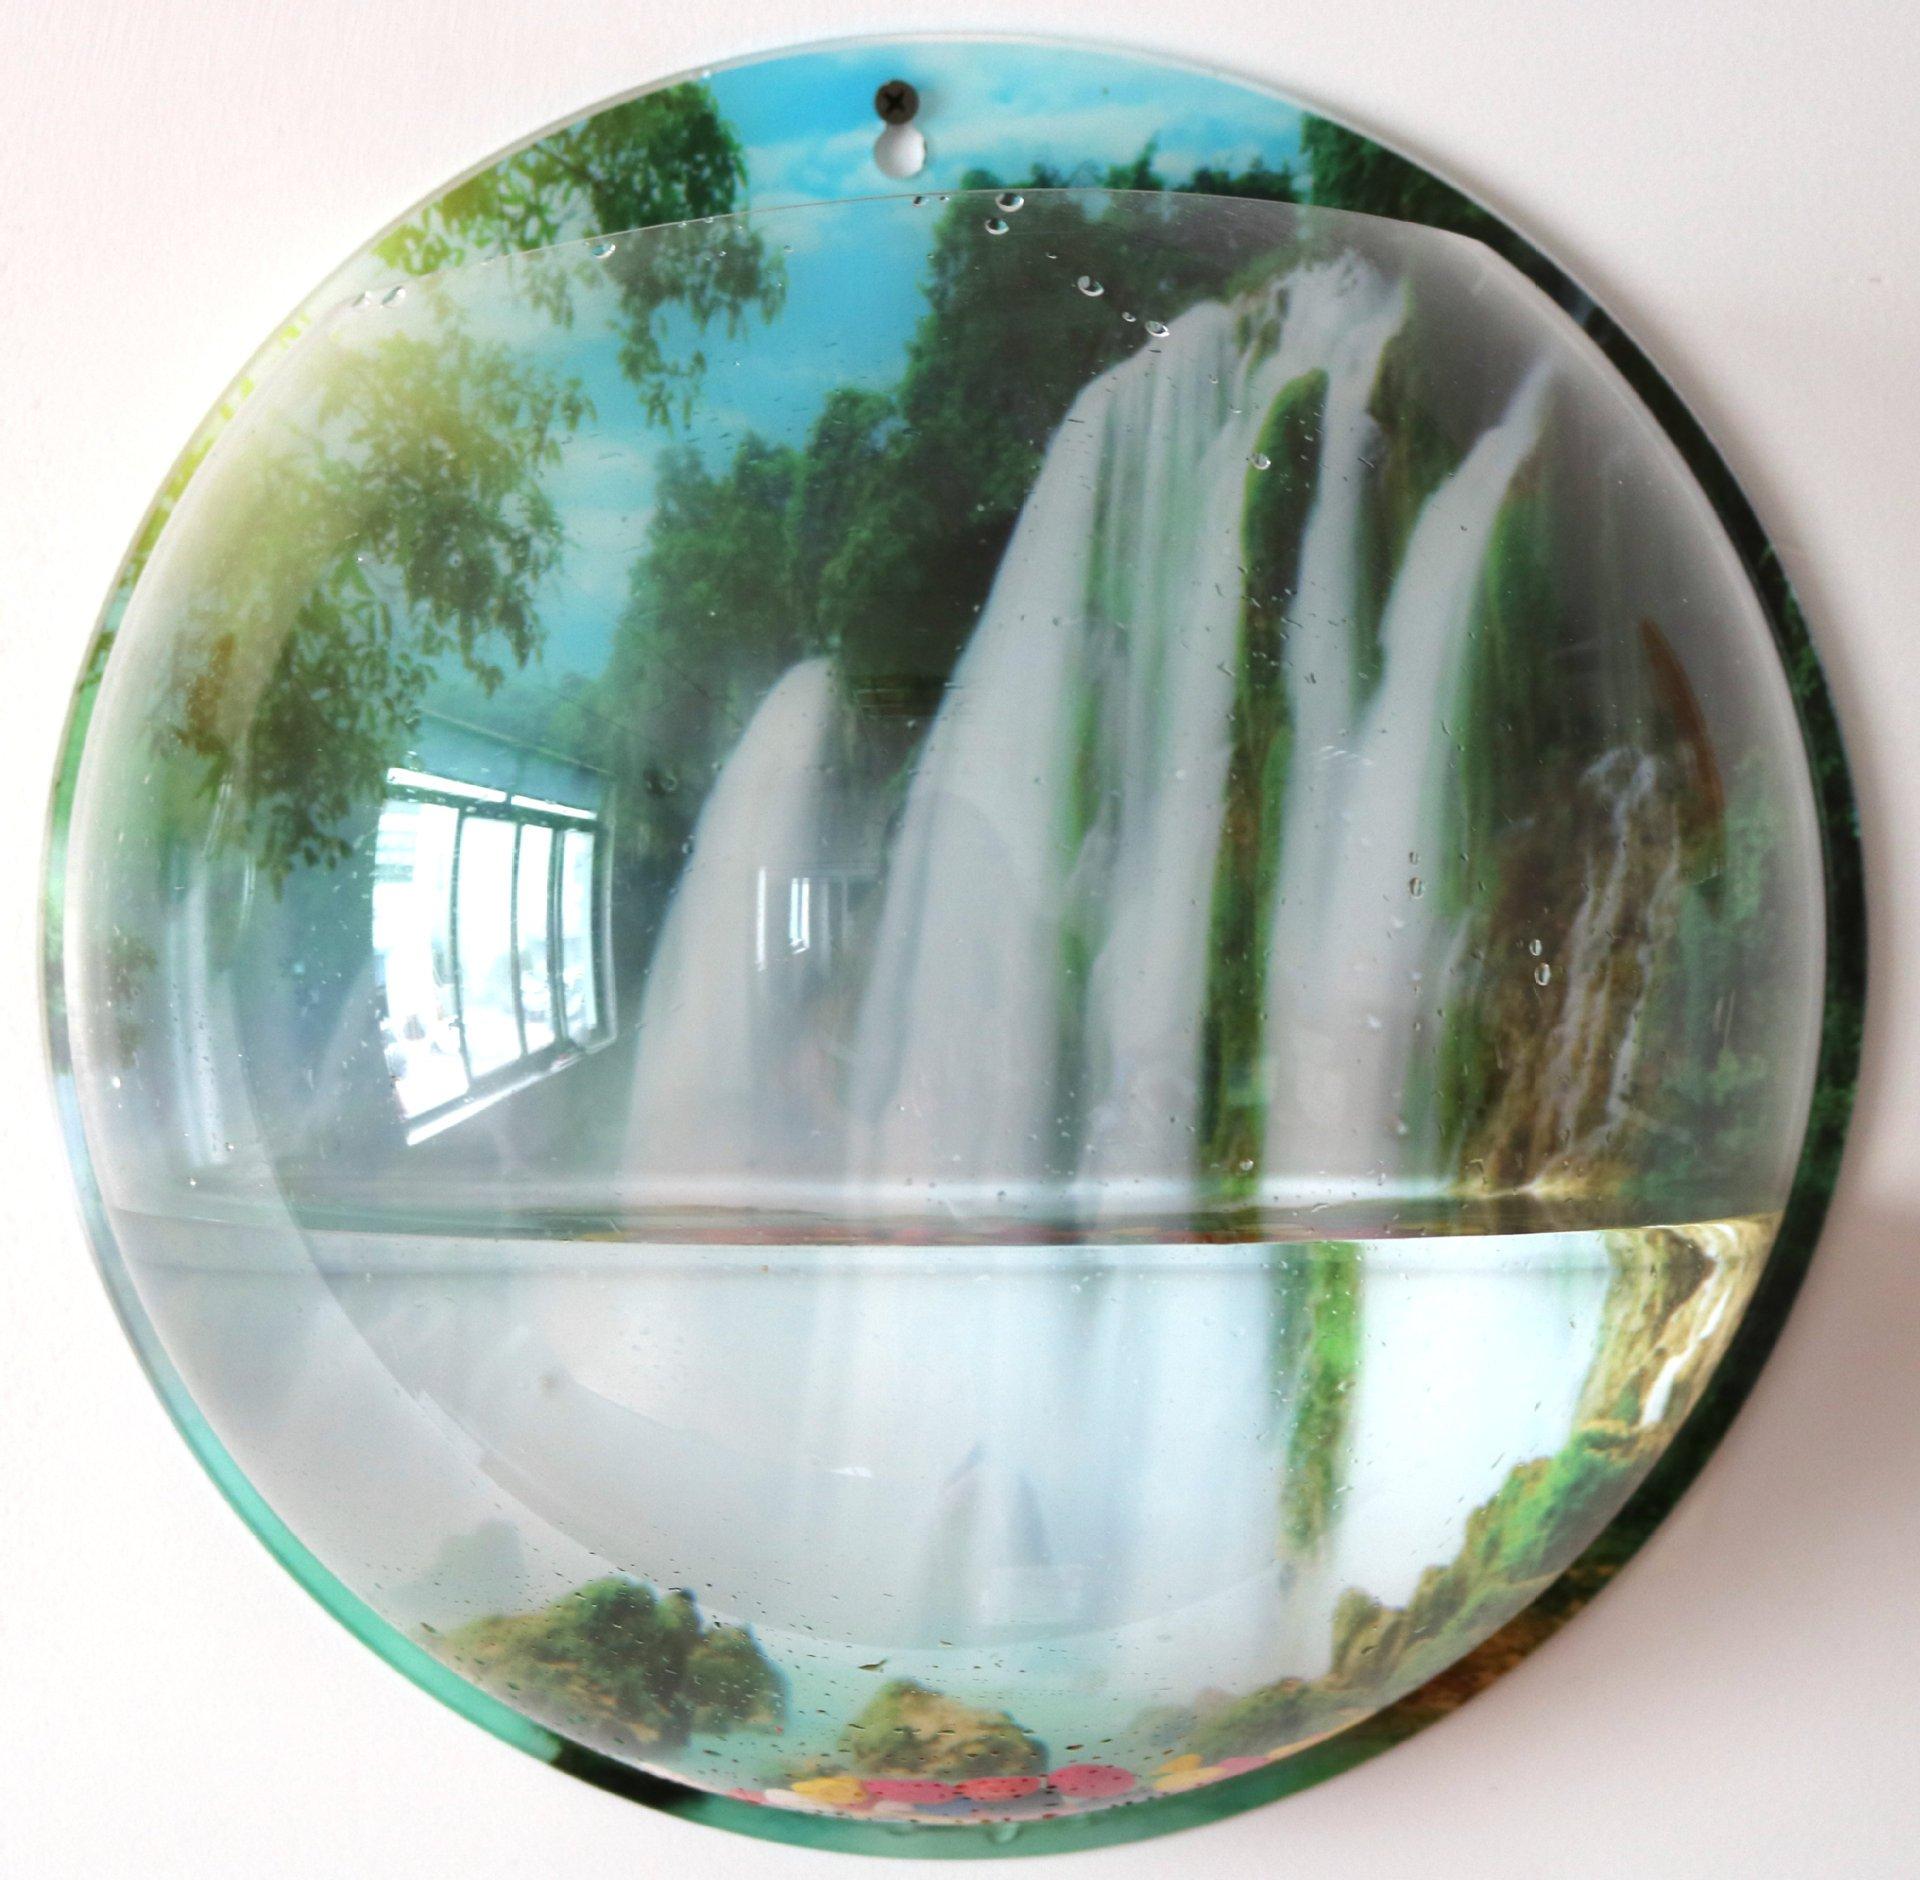 Waterfall Creative Acrylic Hanging Wall Mount Fish Tank Bowl Vase Aquarium Plant Pot Fish Bubble Aquarium Decor for Home and Office